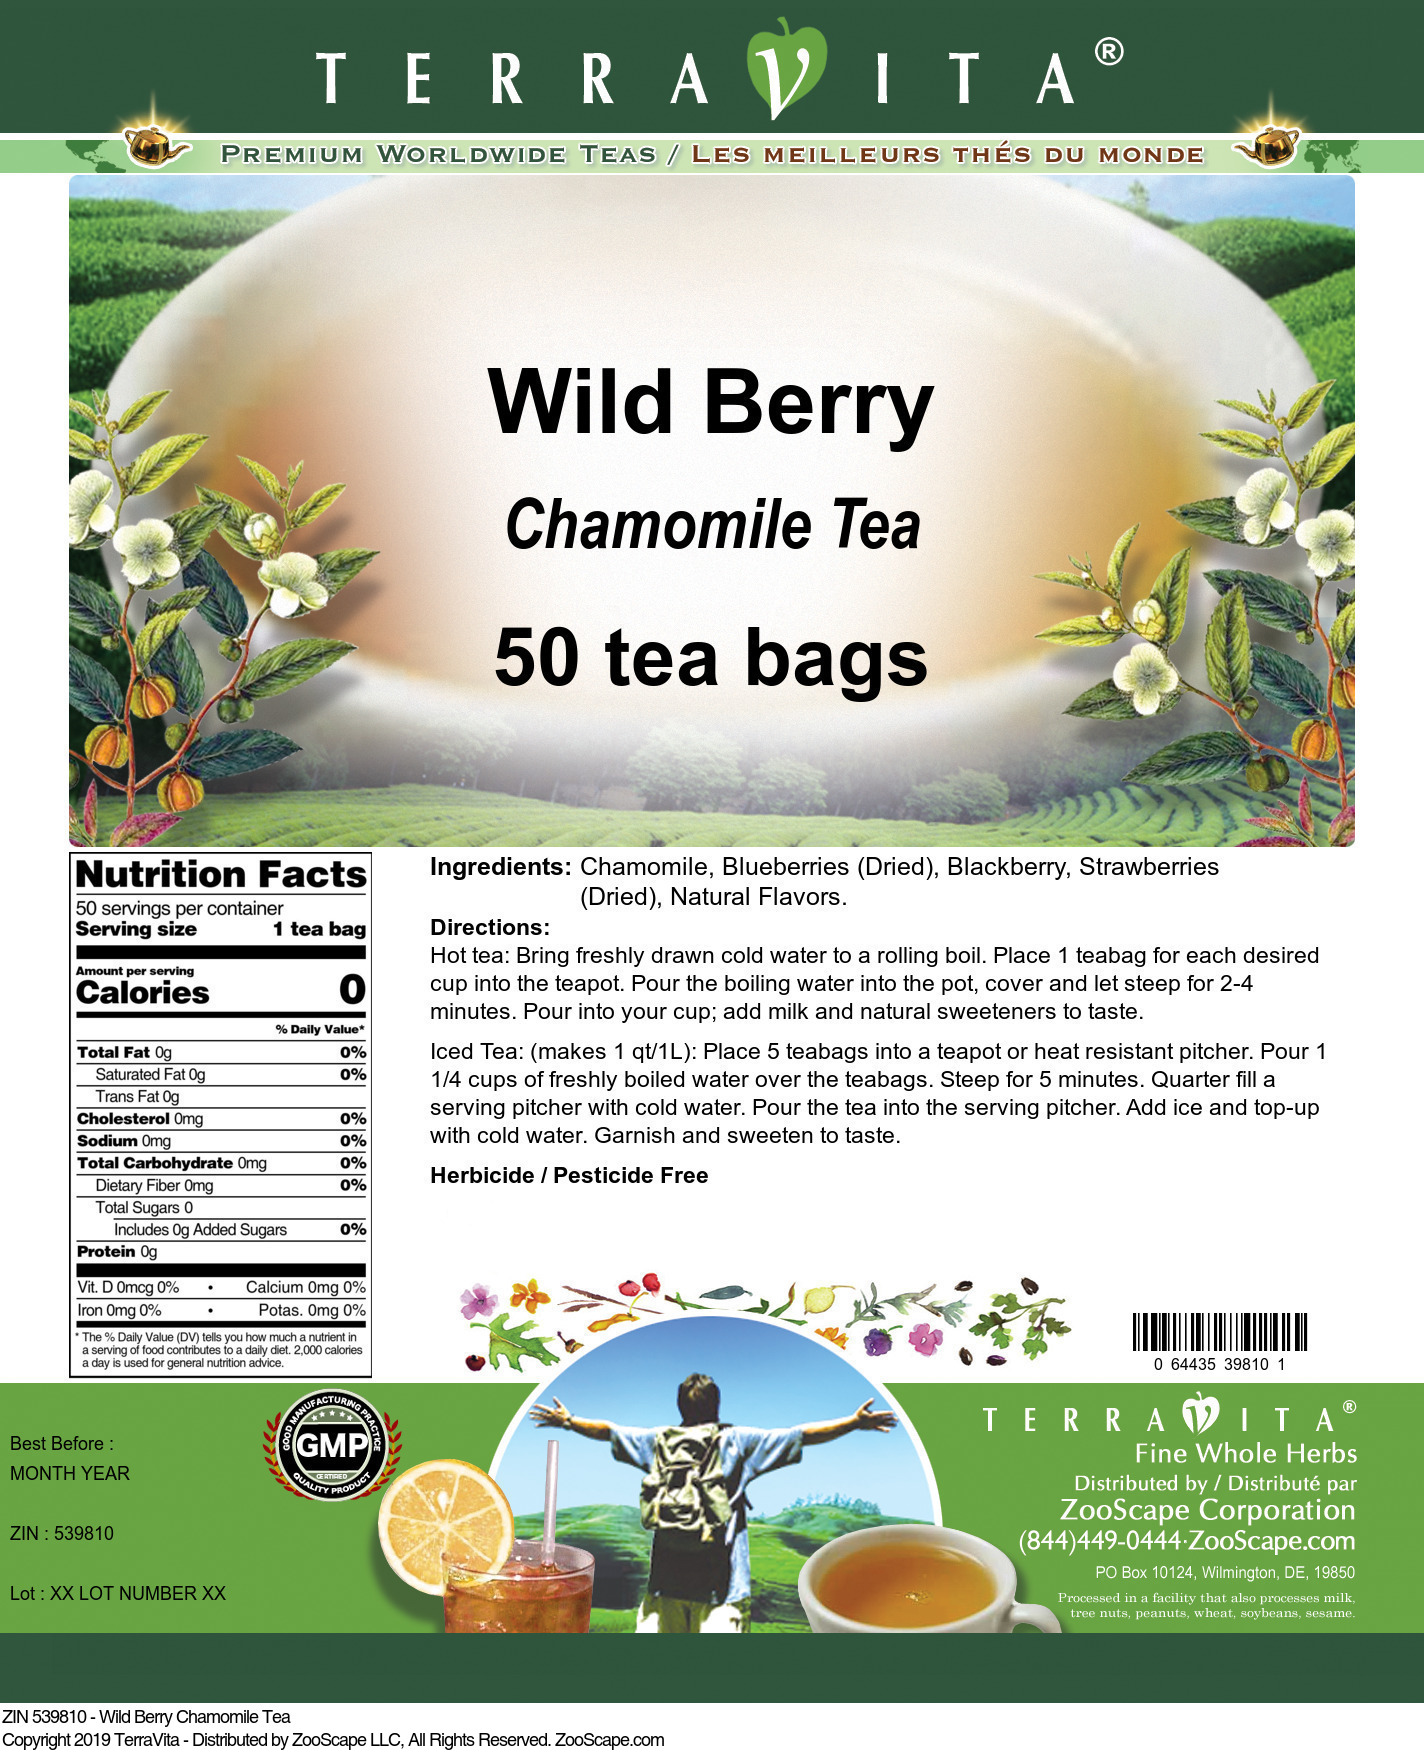 Wild Berry Chamomile Tea